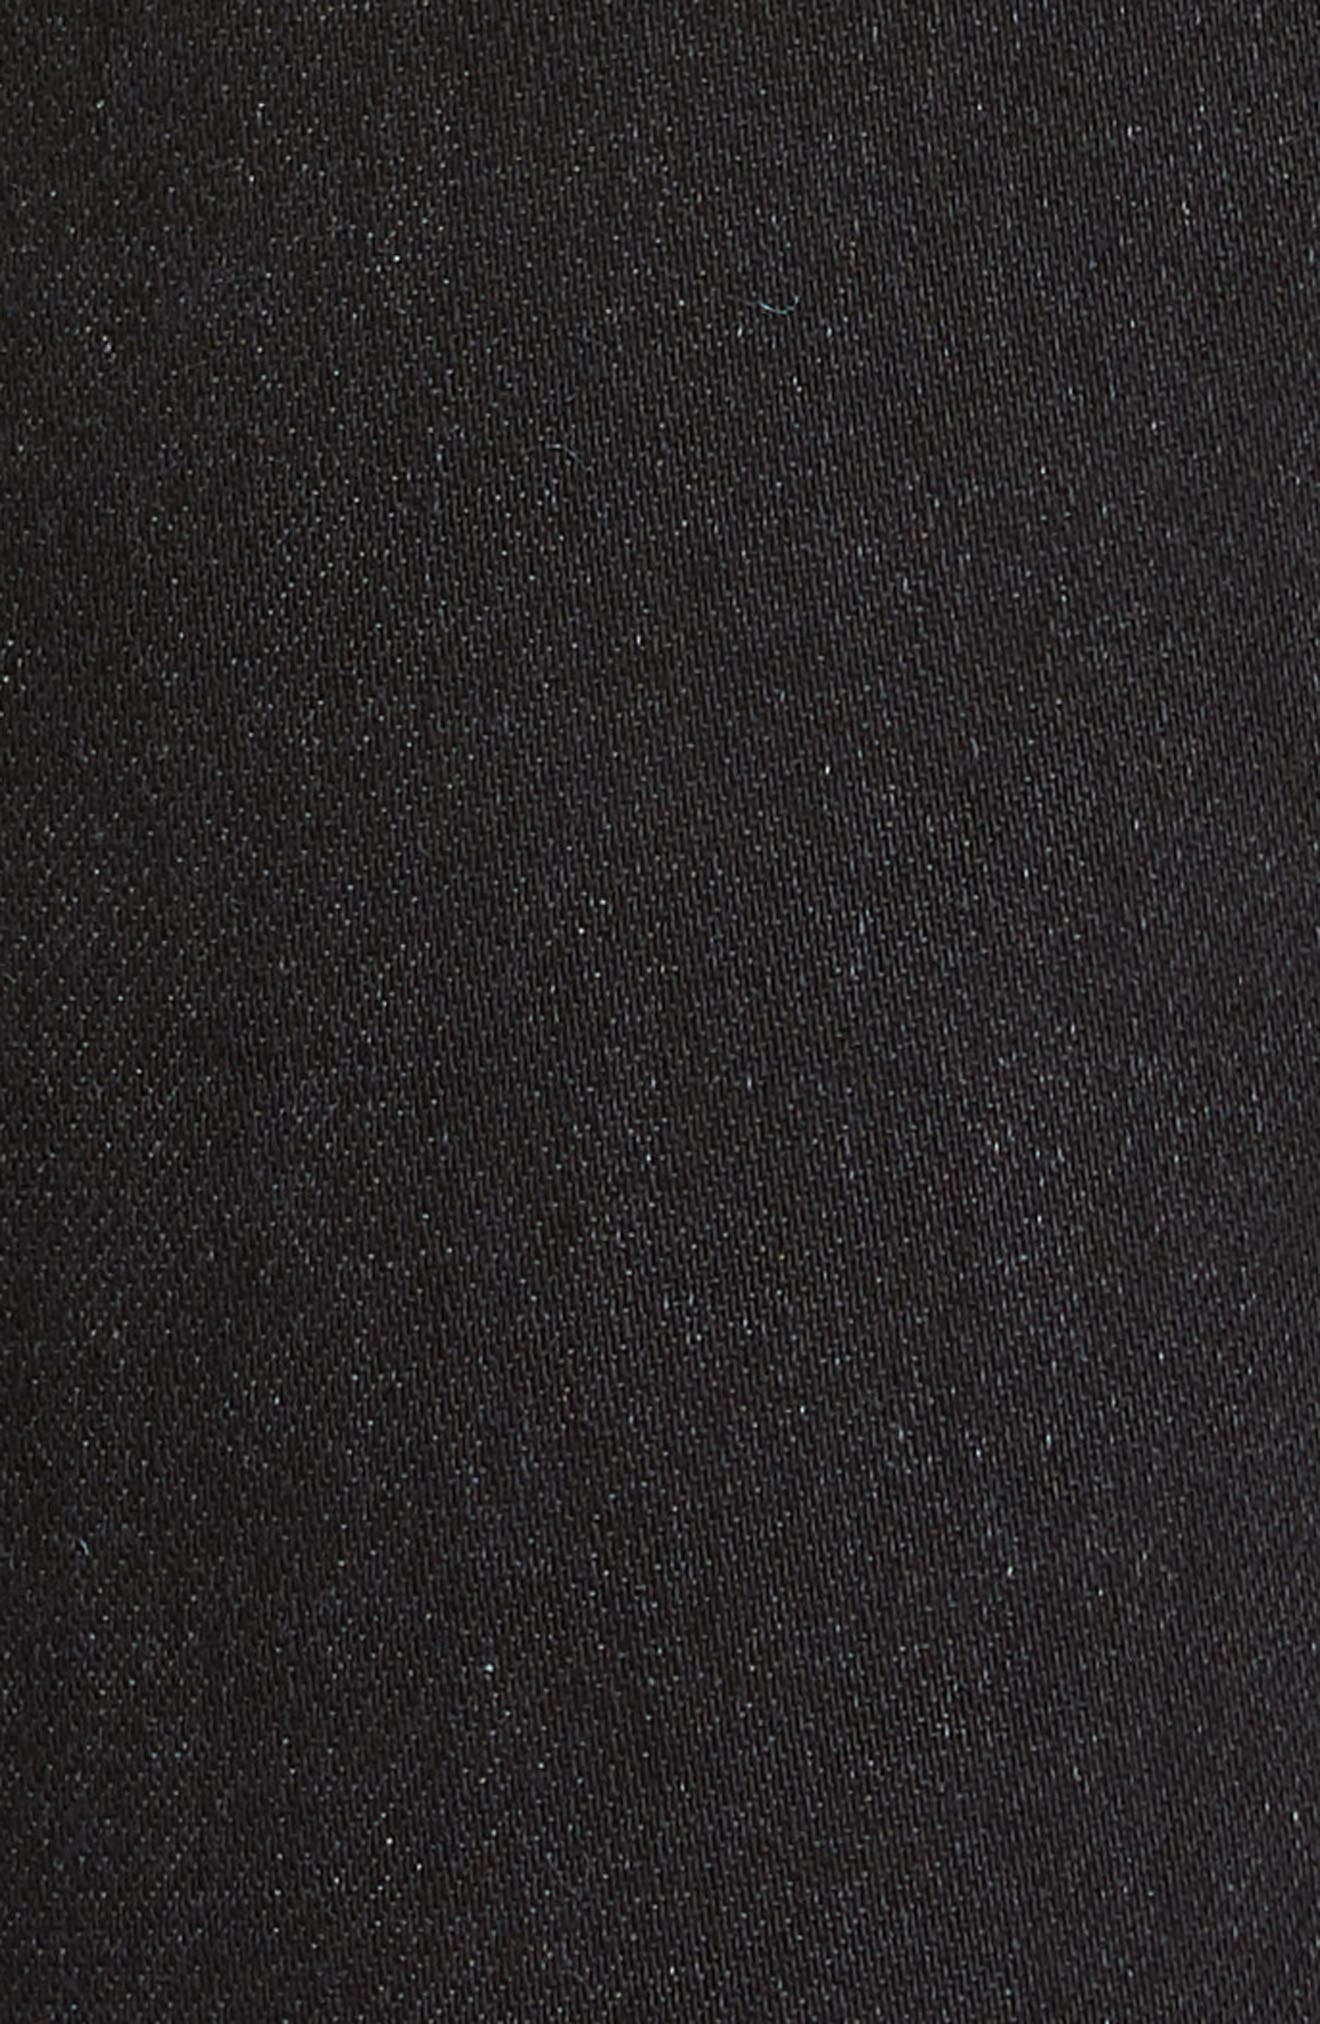 OFF-WHITE, Floral Embroidered Diagonal Stripe Skinny Jeans, Alternate thumbnail 5, color, VINTAGE BLACK